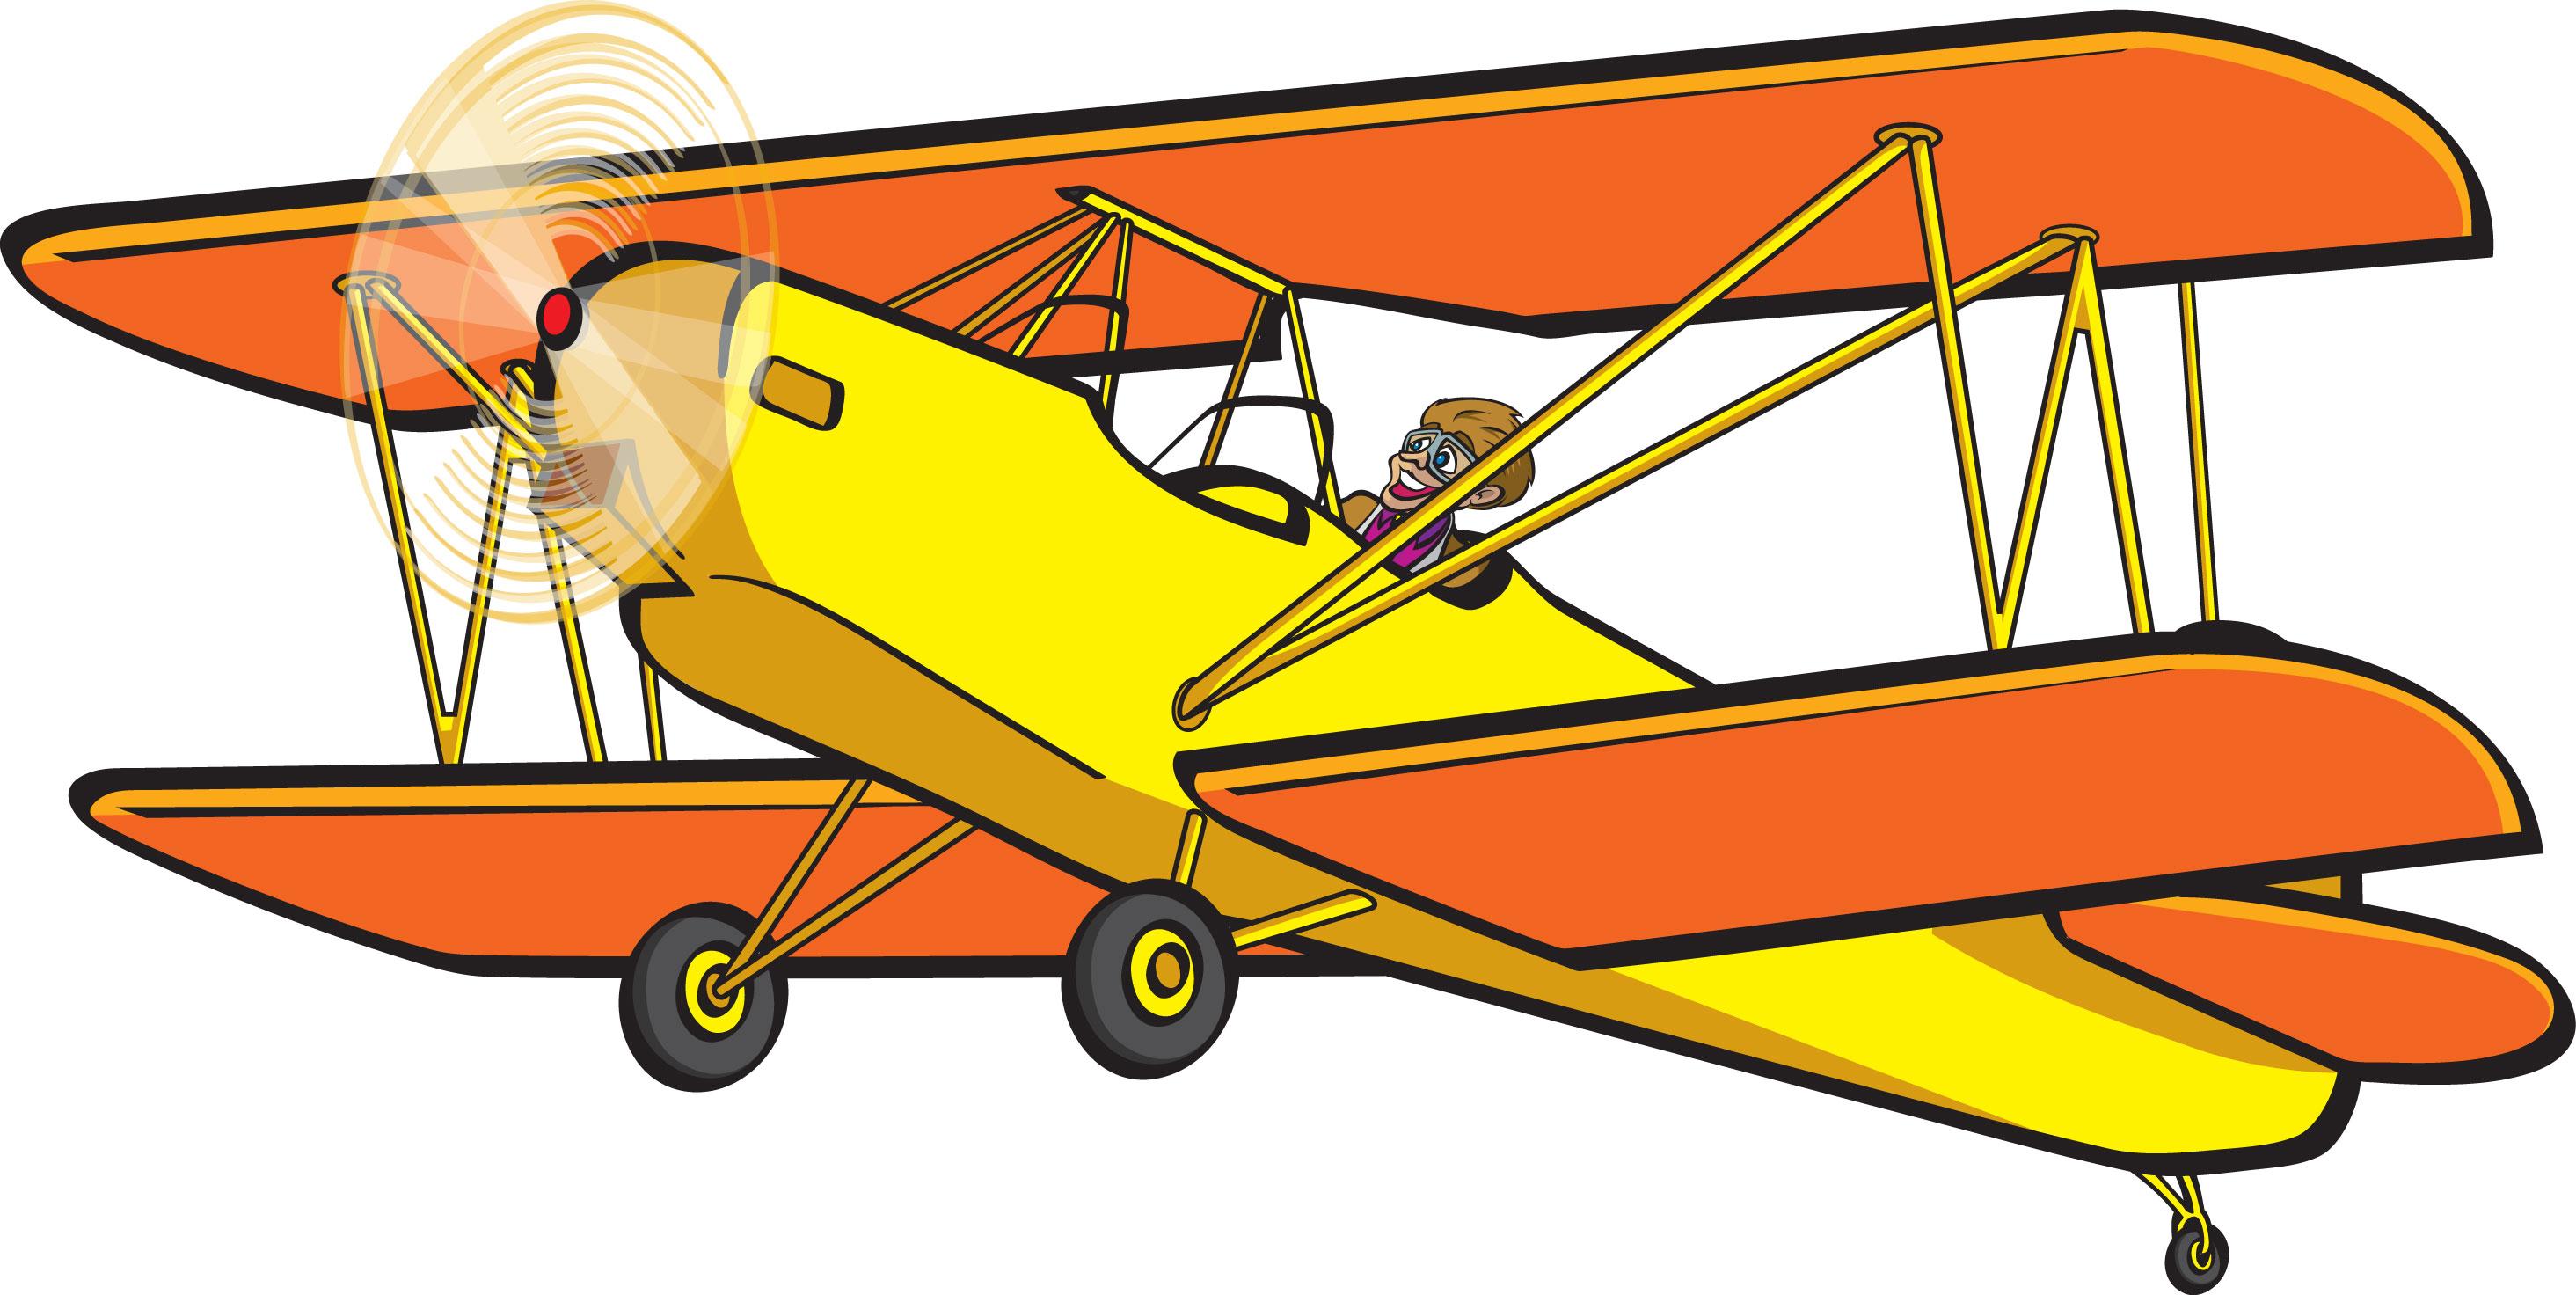 biplane clip art clipart best airplane clipart border airplane clipart silhouette